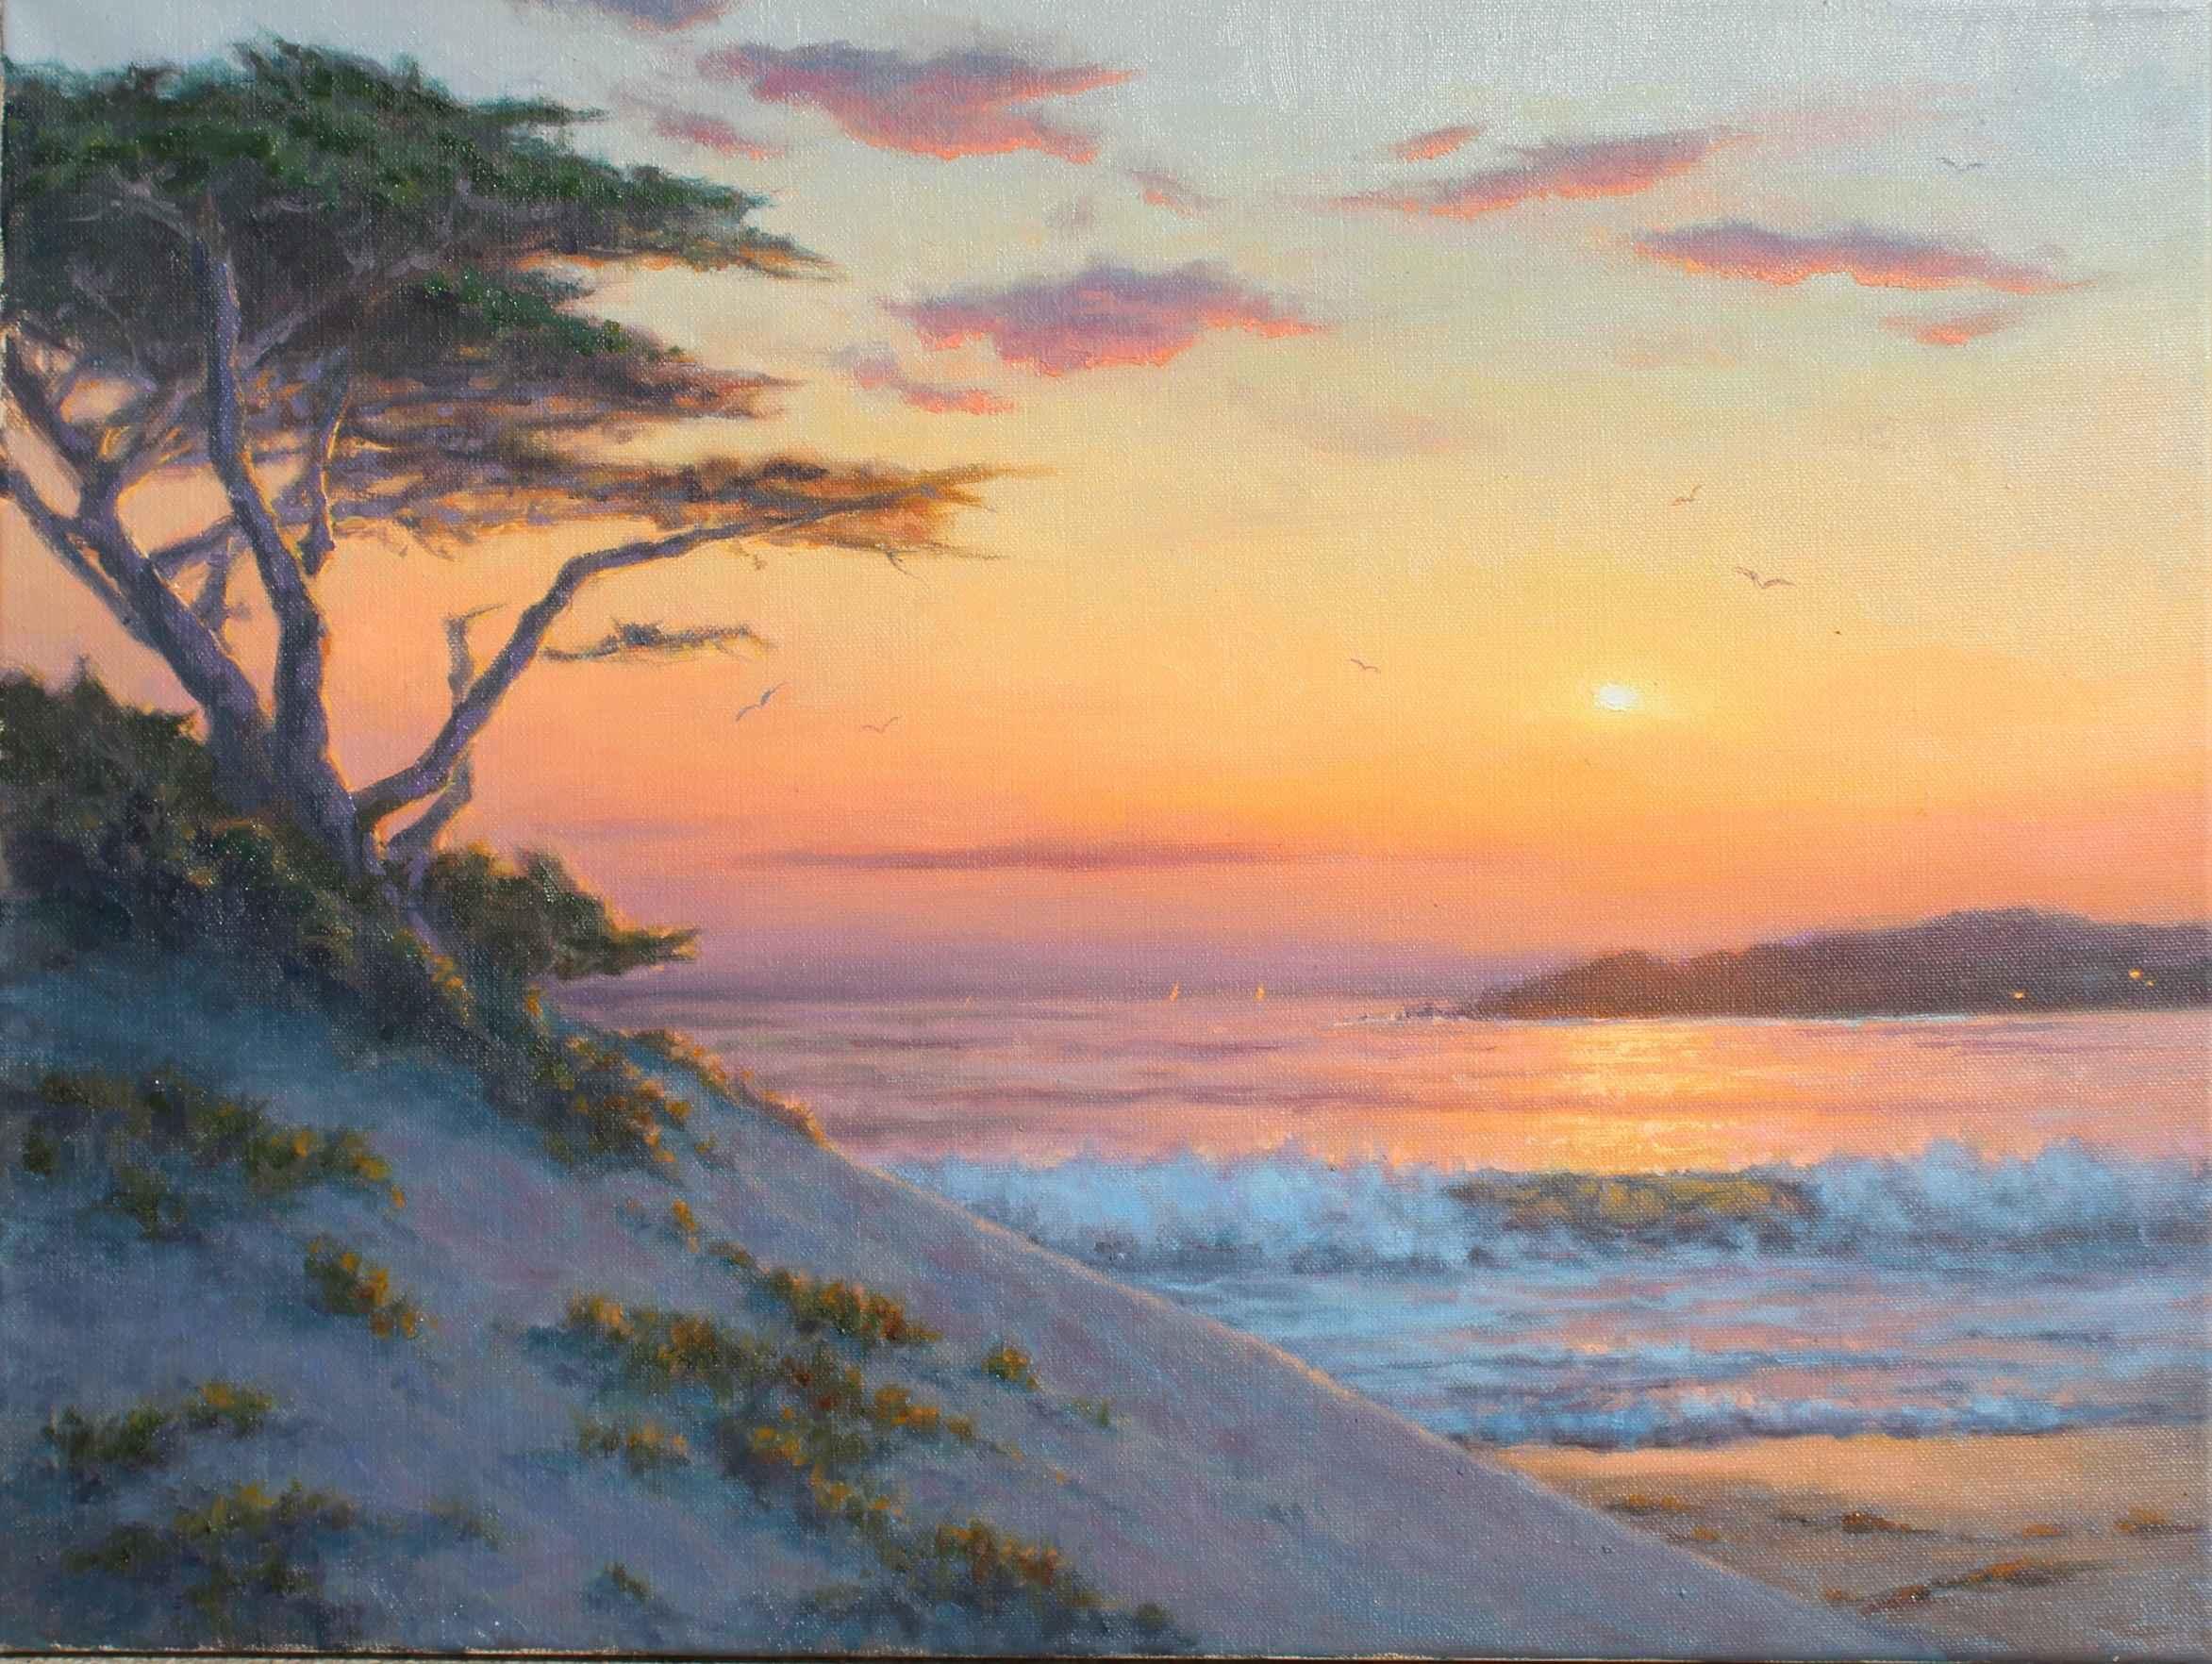 Surf, Sand & Seagulls by  Sally  Jordan - Masterpiece Online